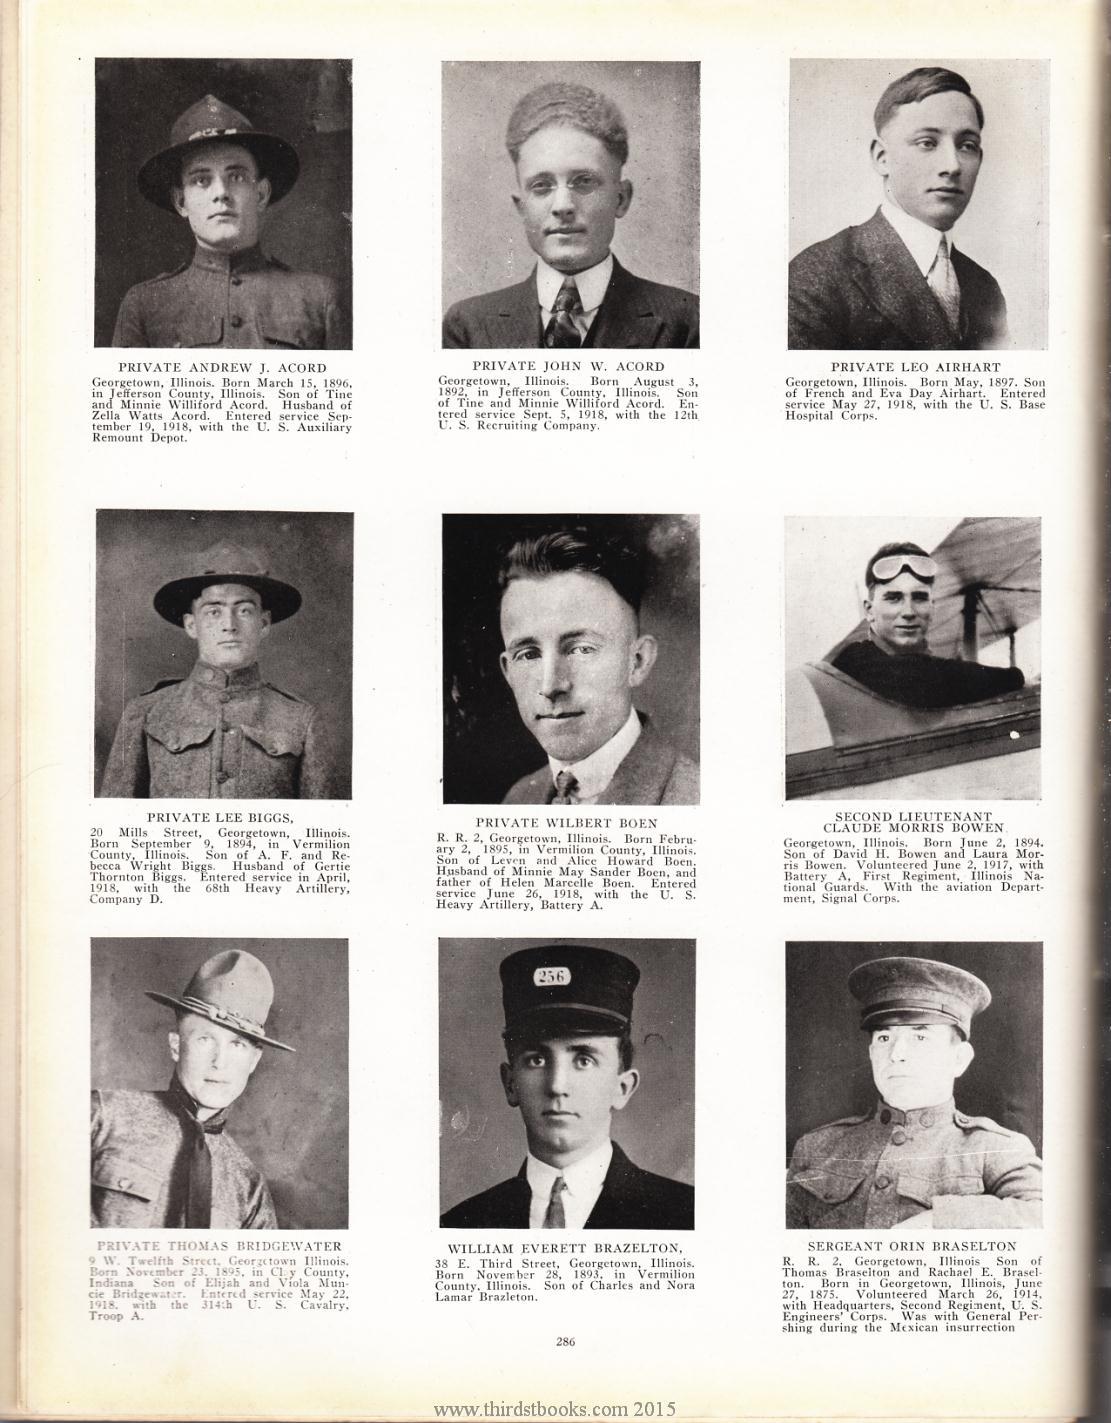 Illinois vermilion county muncie - Andrew Acord Page 286